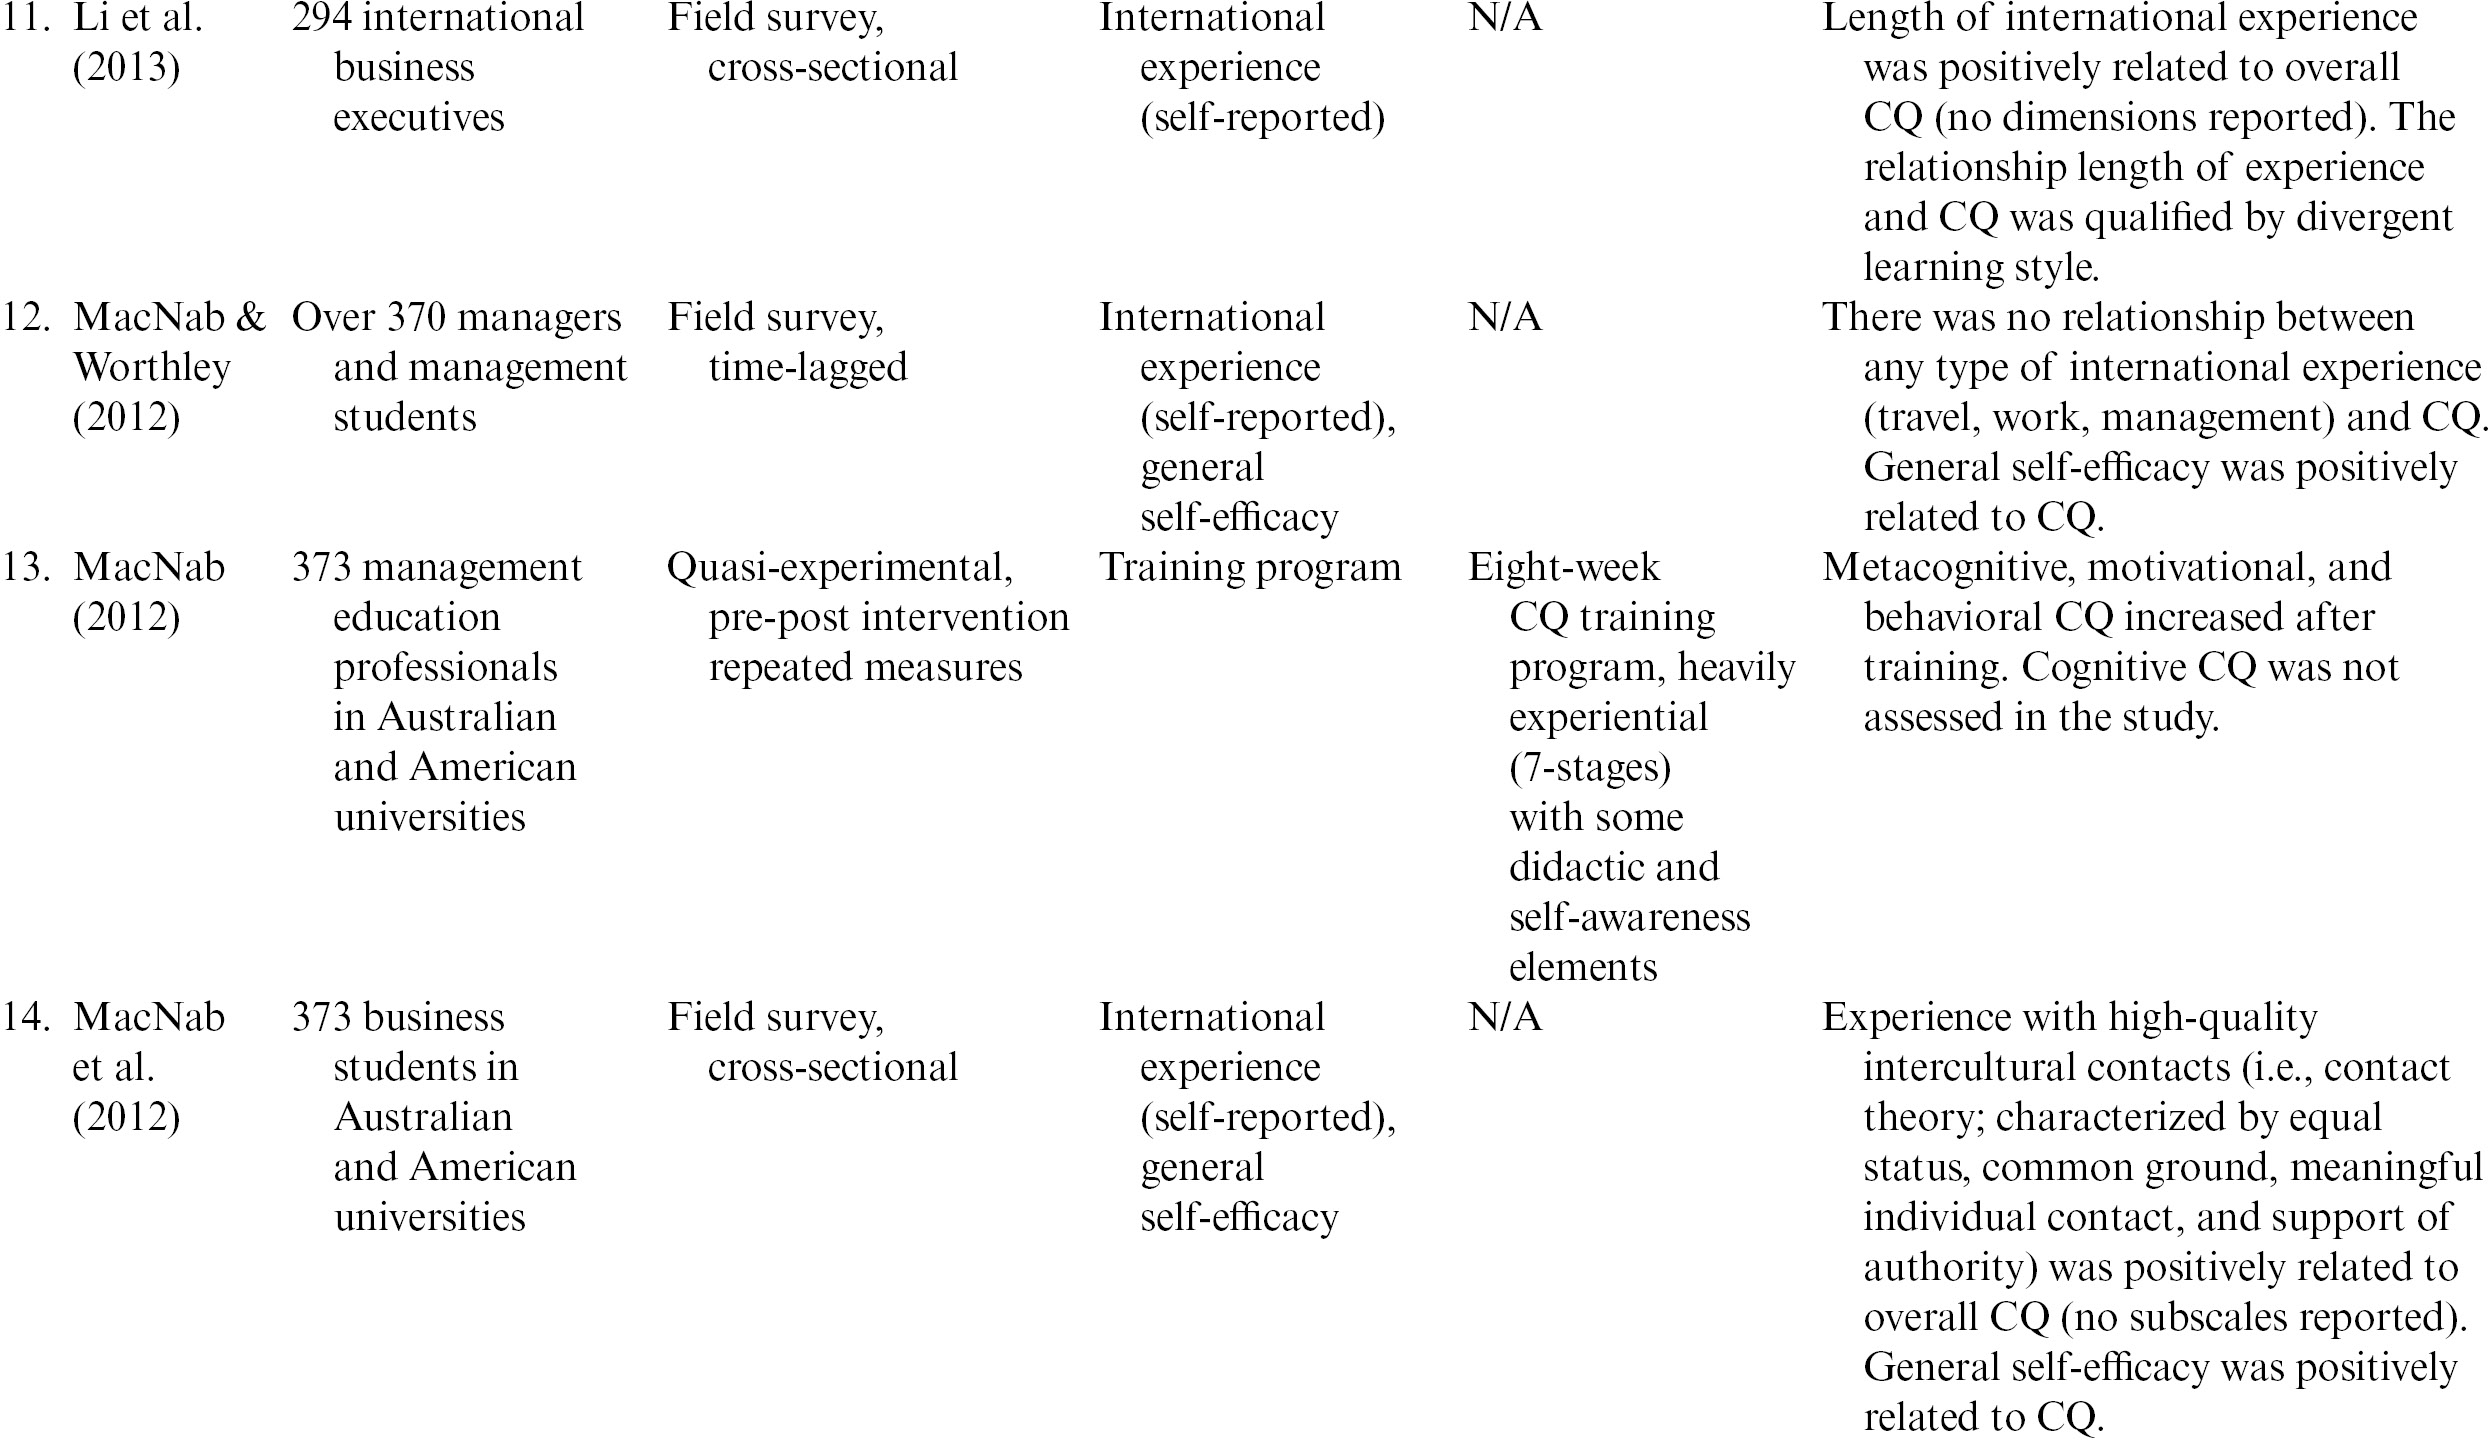 Special Topics (Part IV) - The Cambridge Handbook of